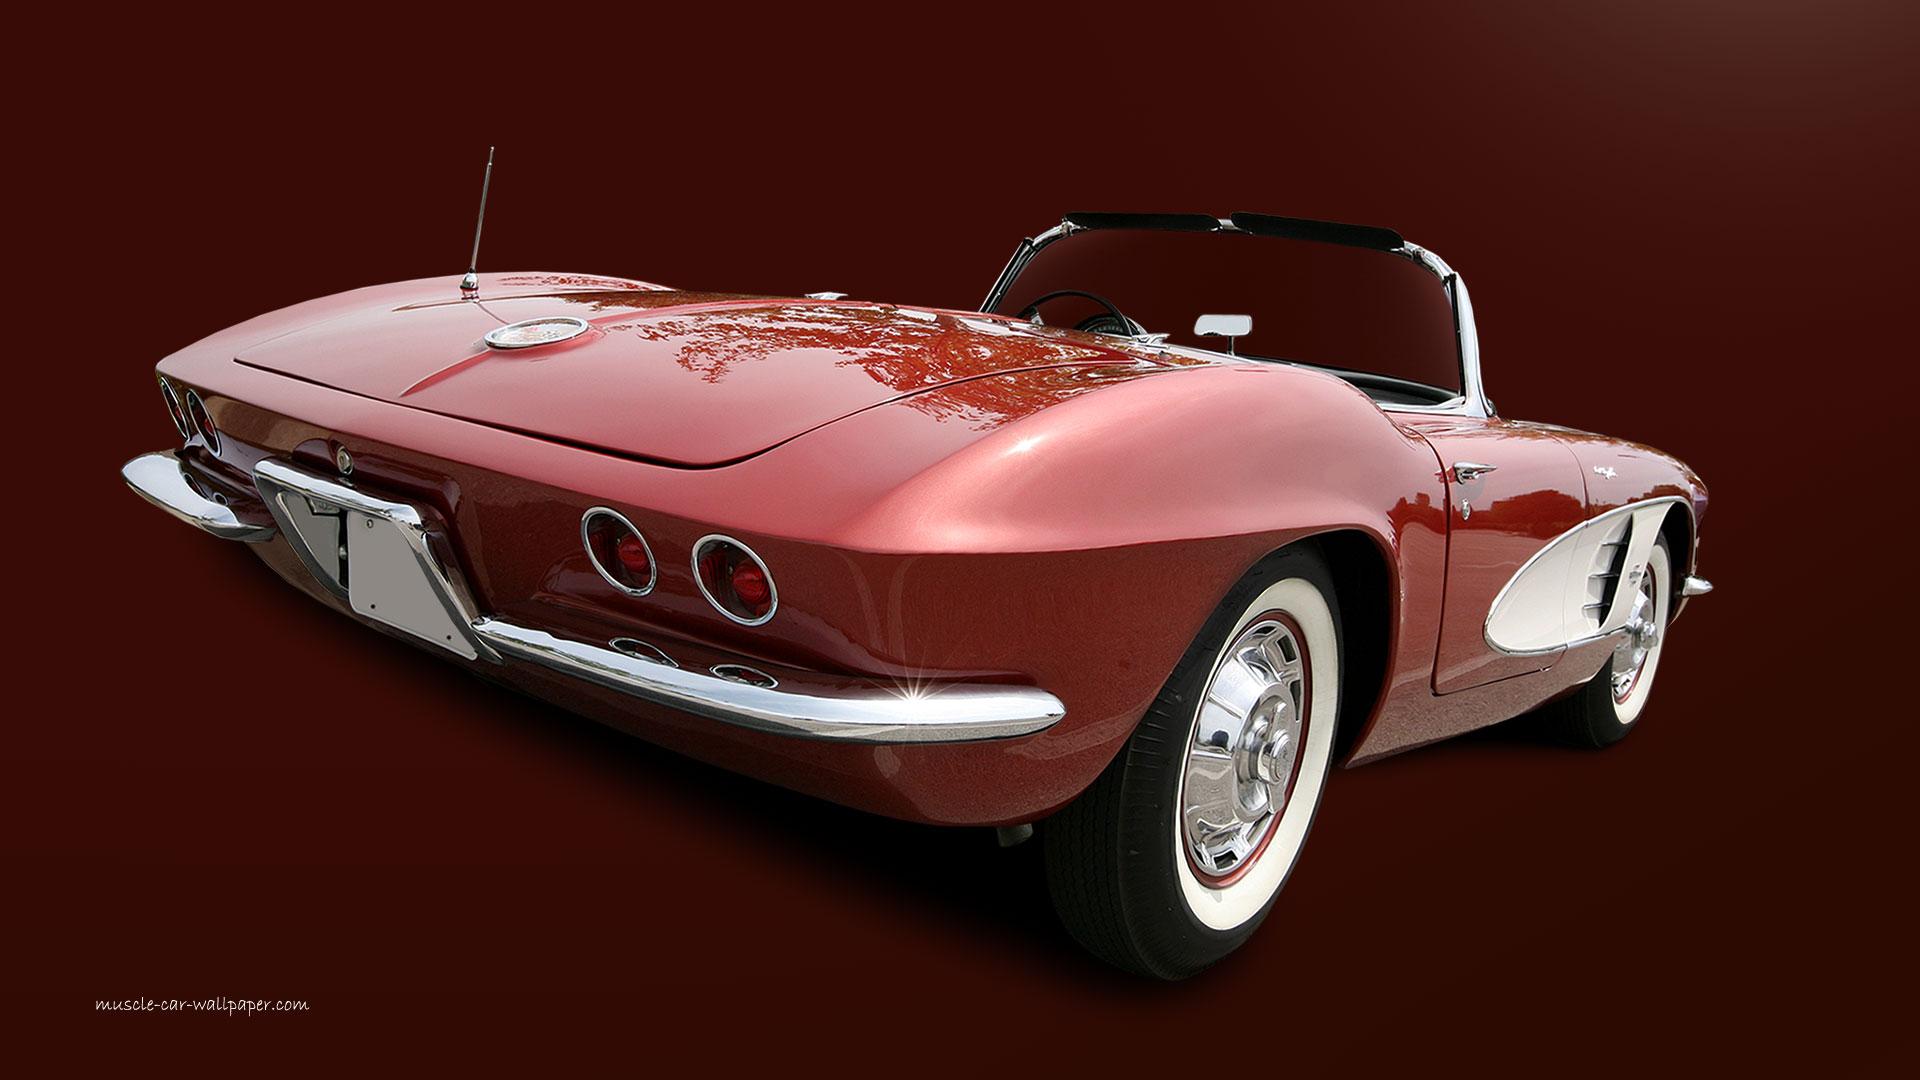 1962-corvette-convertible-1920x1080-02-1-